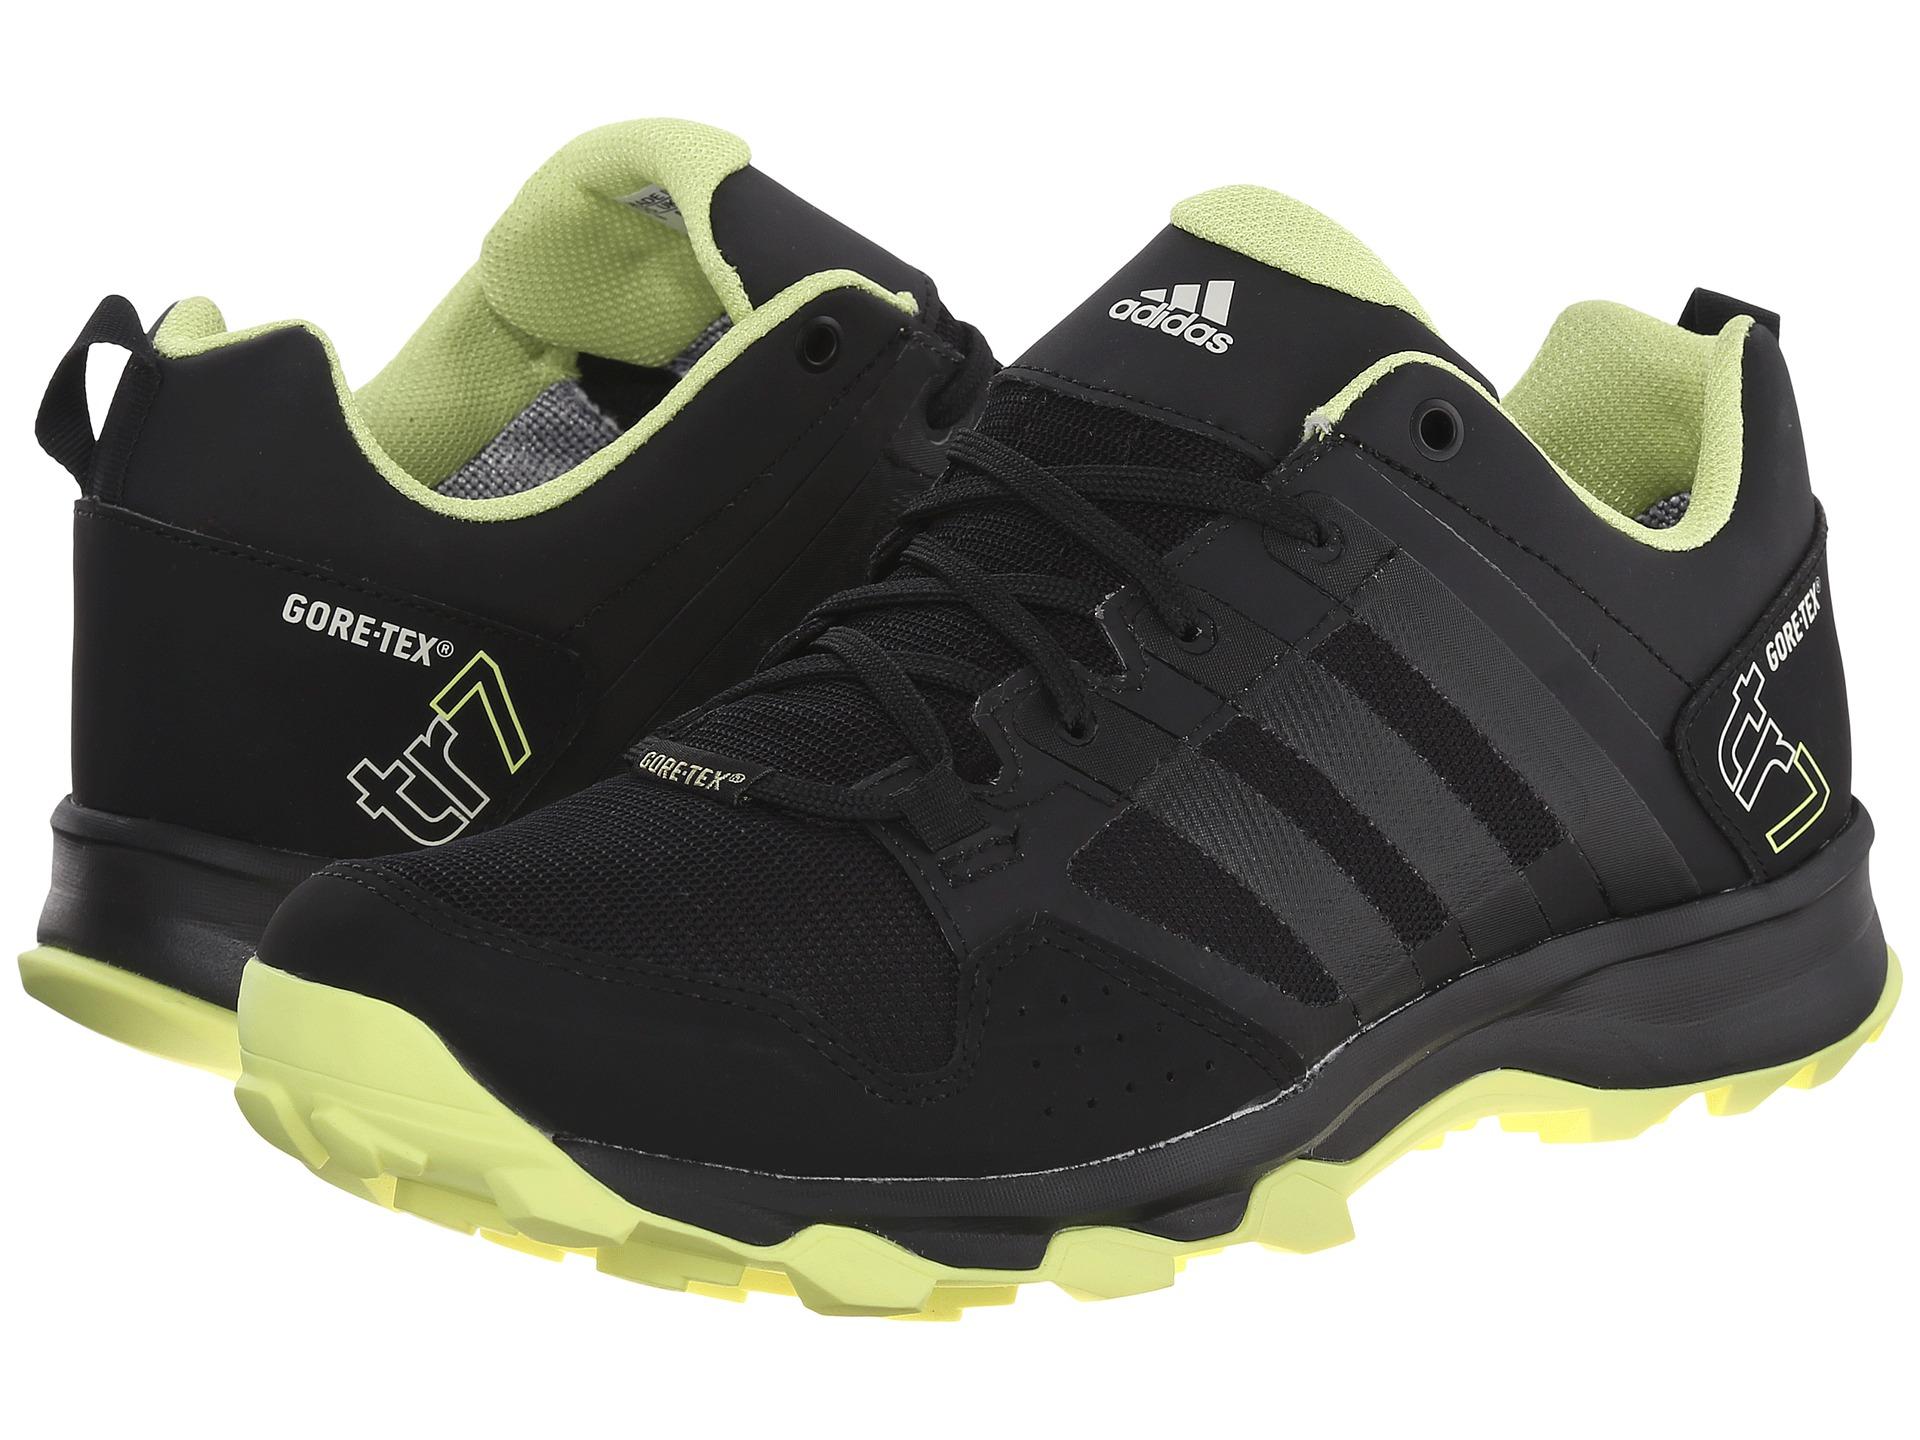 adidas kanadia gore-tex running shoes